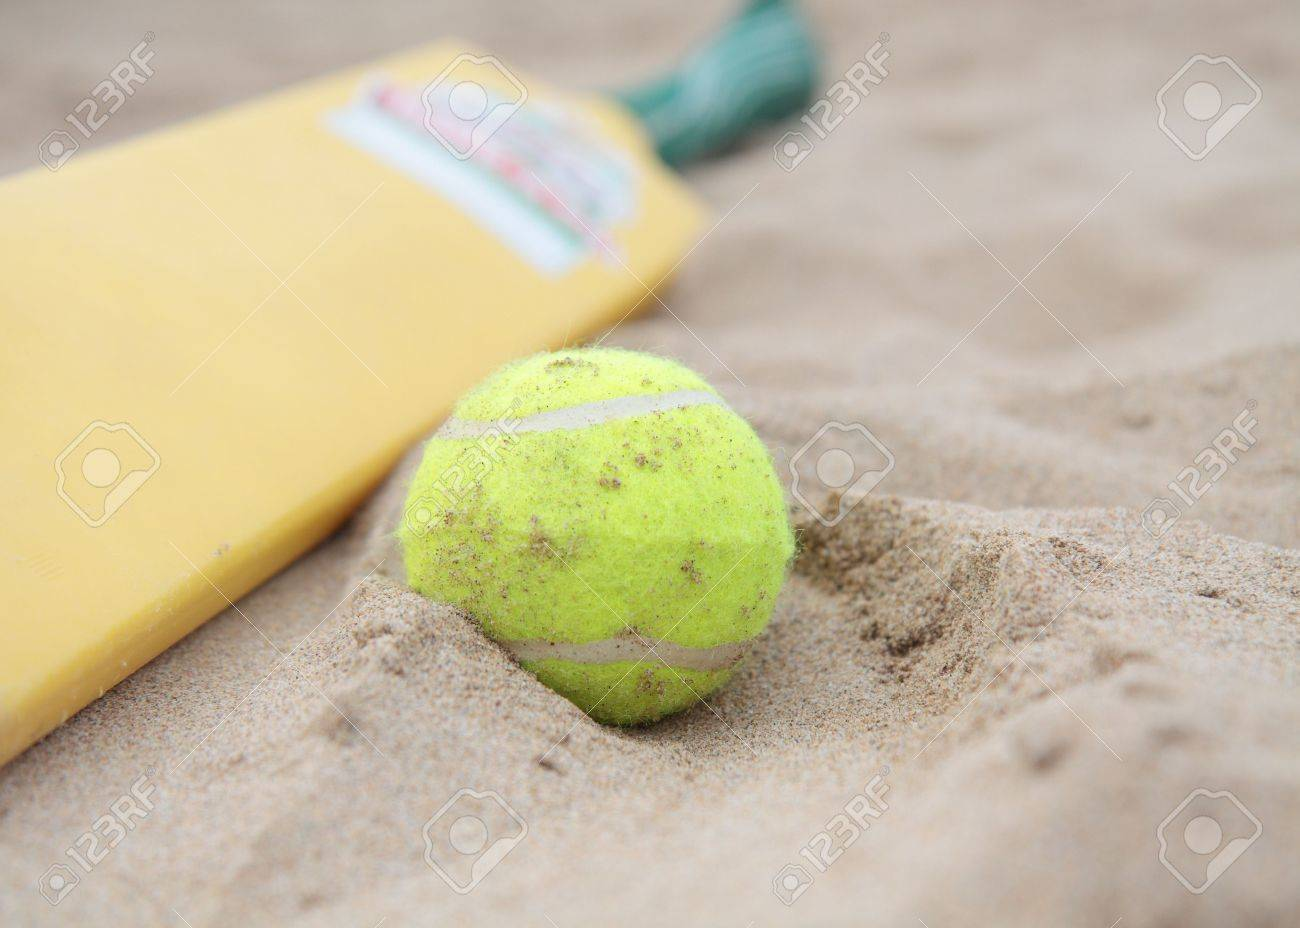 A Beach Cricket Bat With Tennis Ball On The Sand Stock Photo